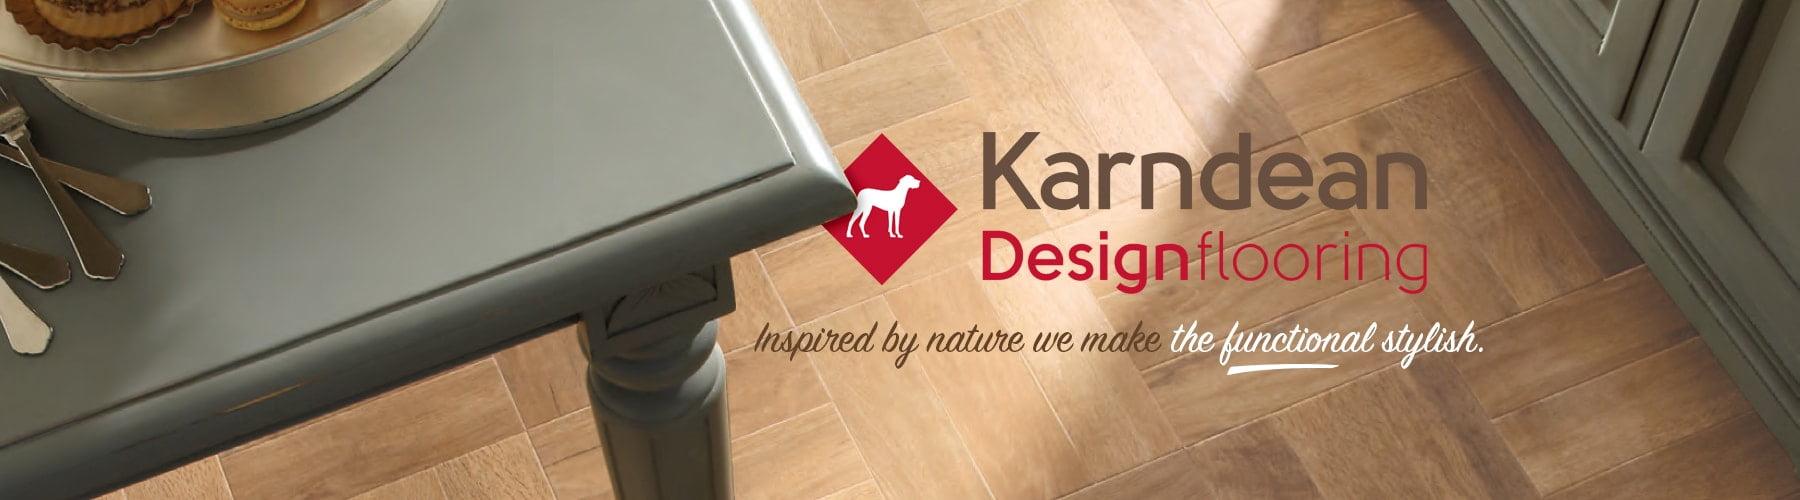 karndean flooring home banner